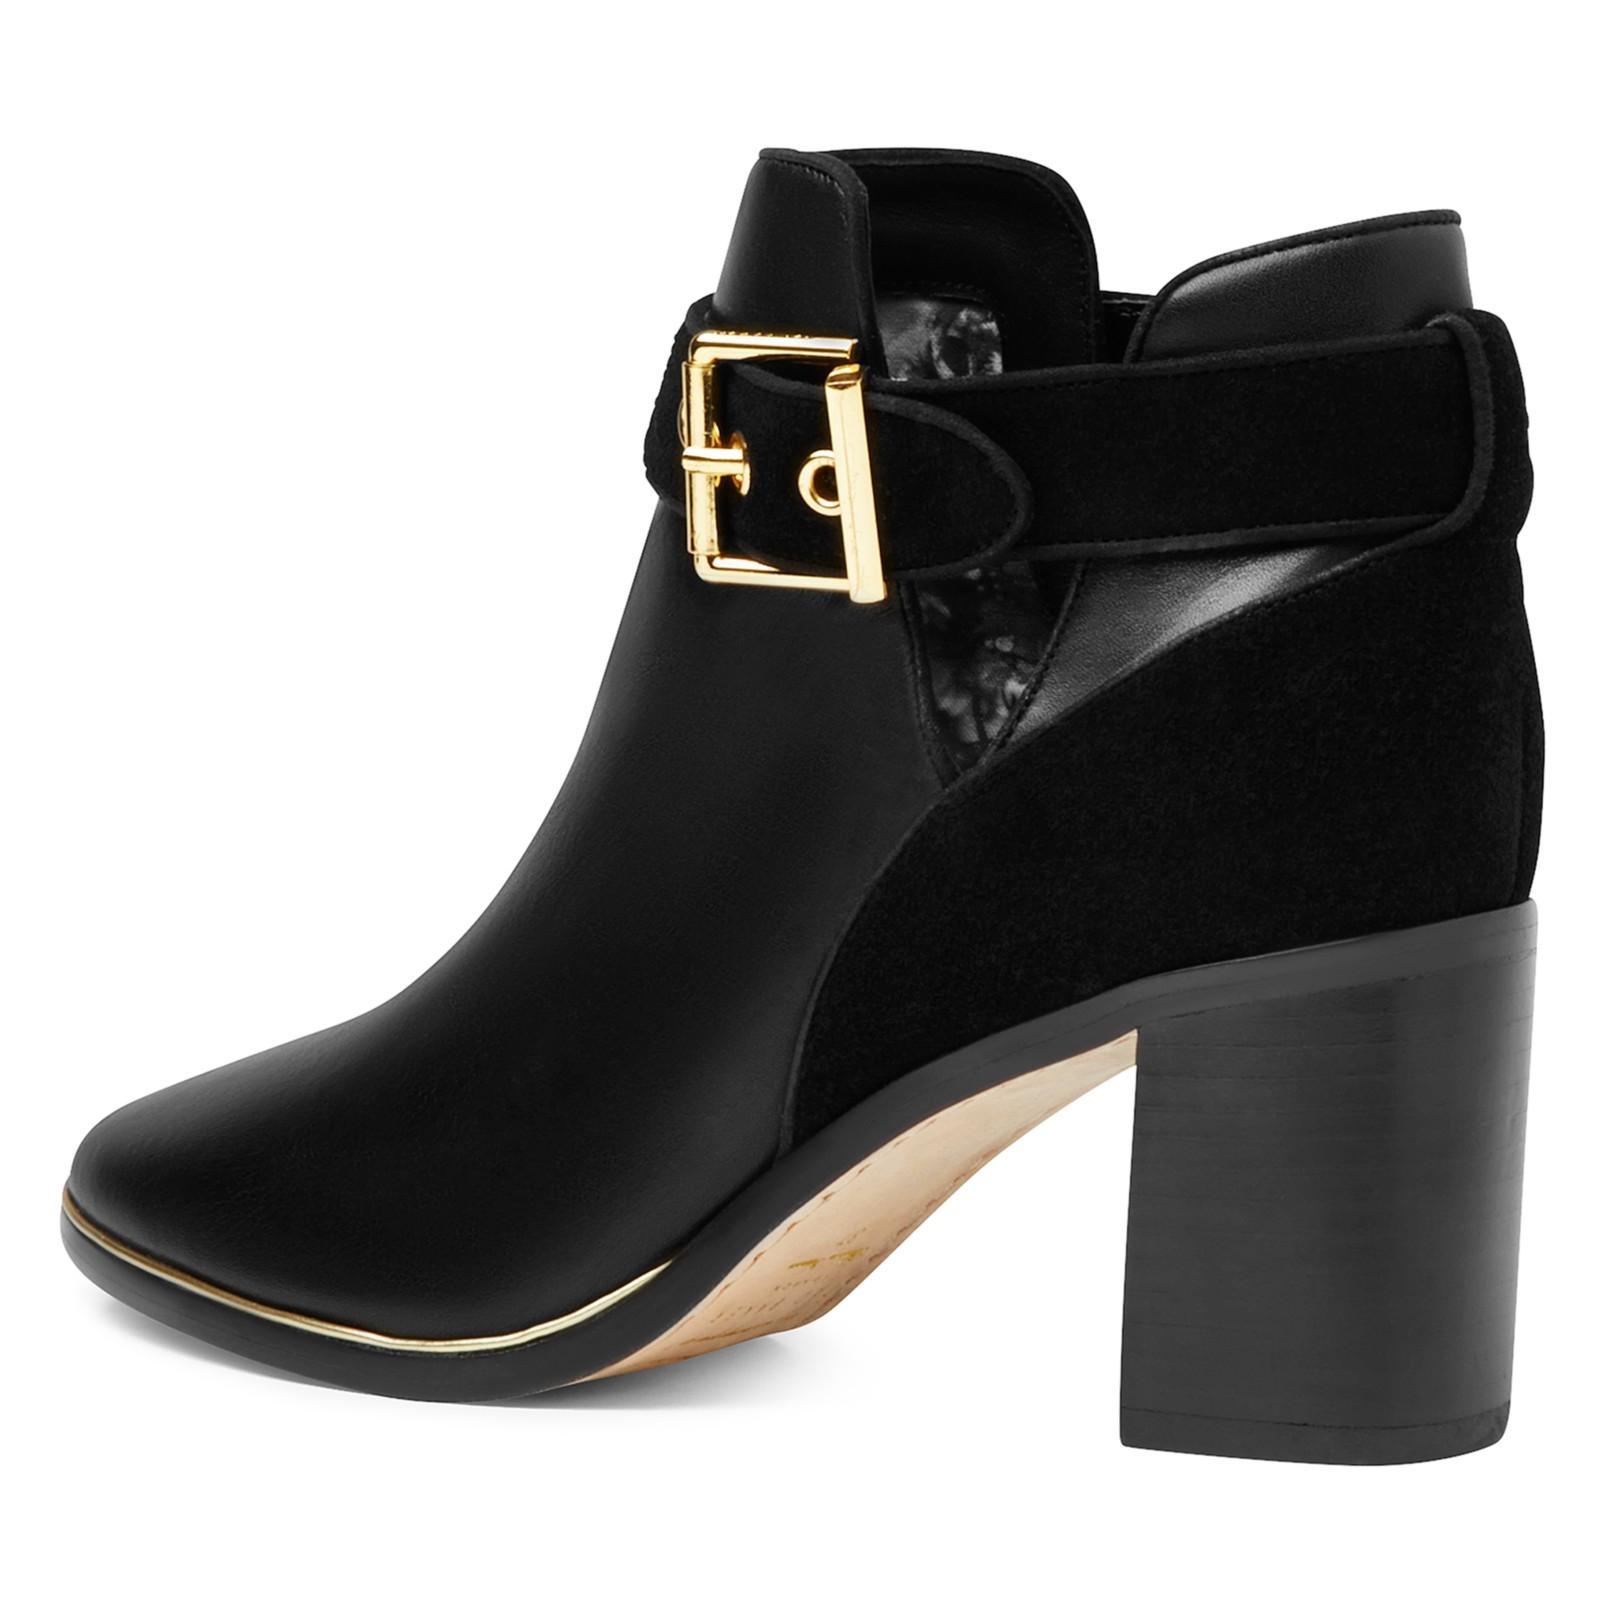 Ted Baker Suede Nissie Block Heel Ankle Boots in Black